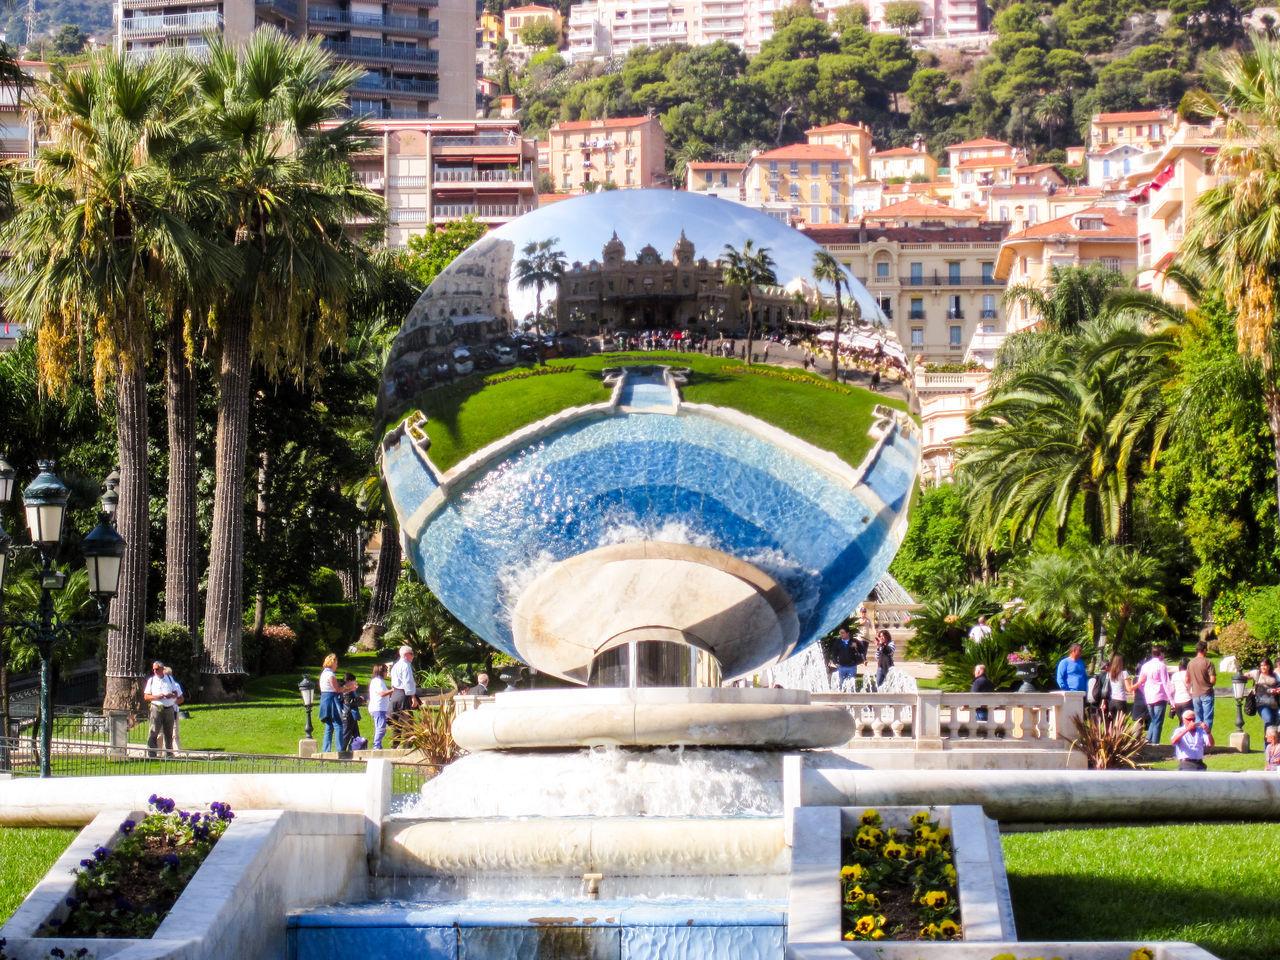 Casino Fountain Holiday Mirror Reflection Mirrow Monaco Palm Tree Refelction  Tourism Tourist Attraction  Tree